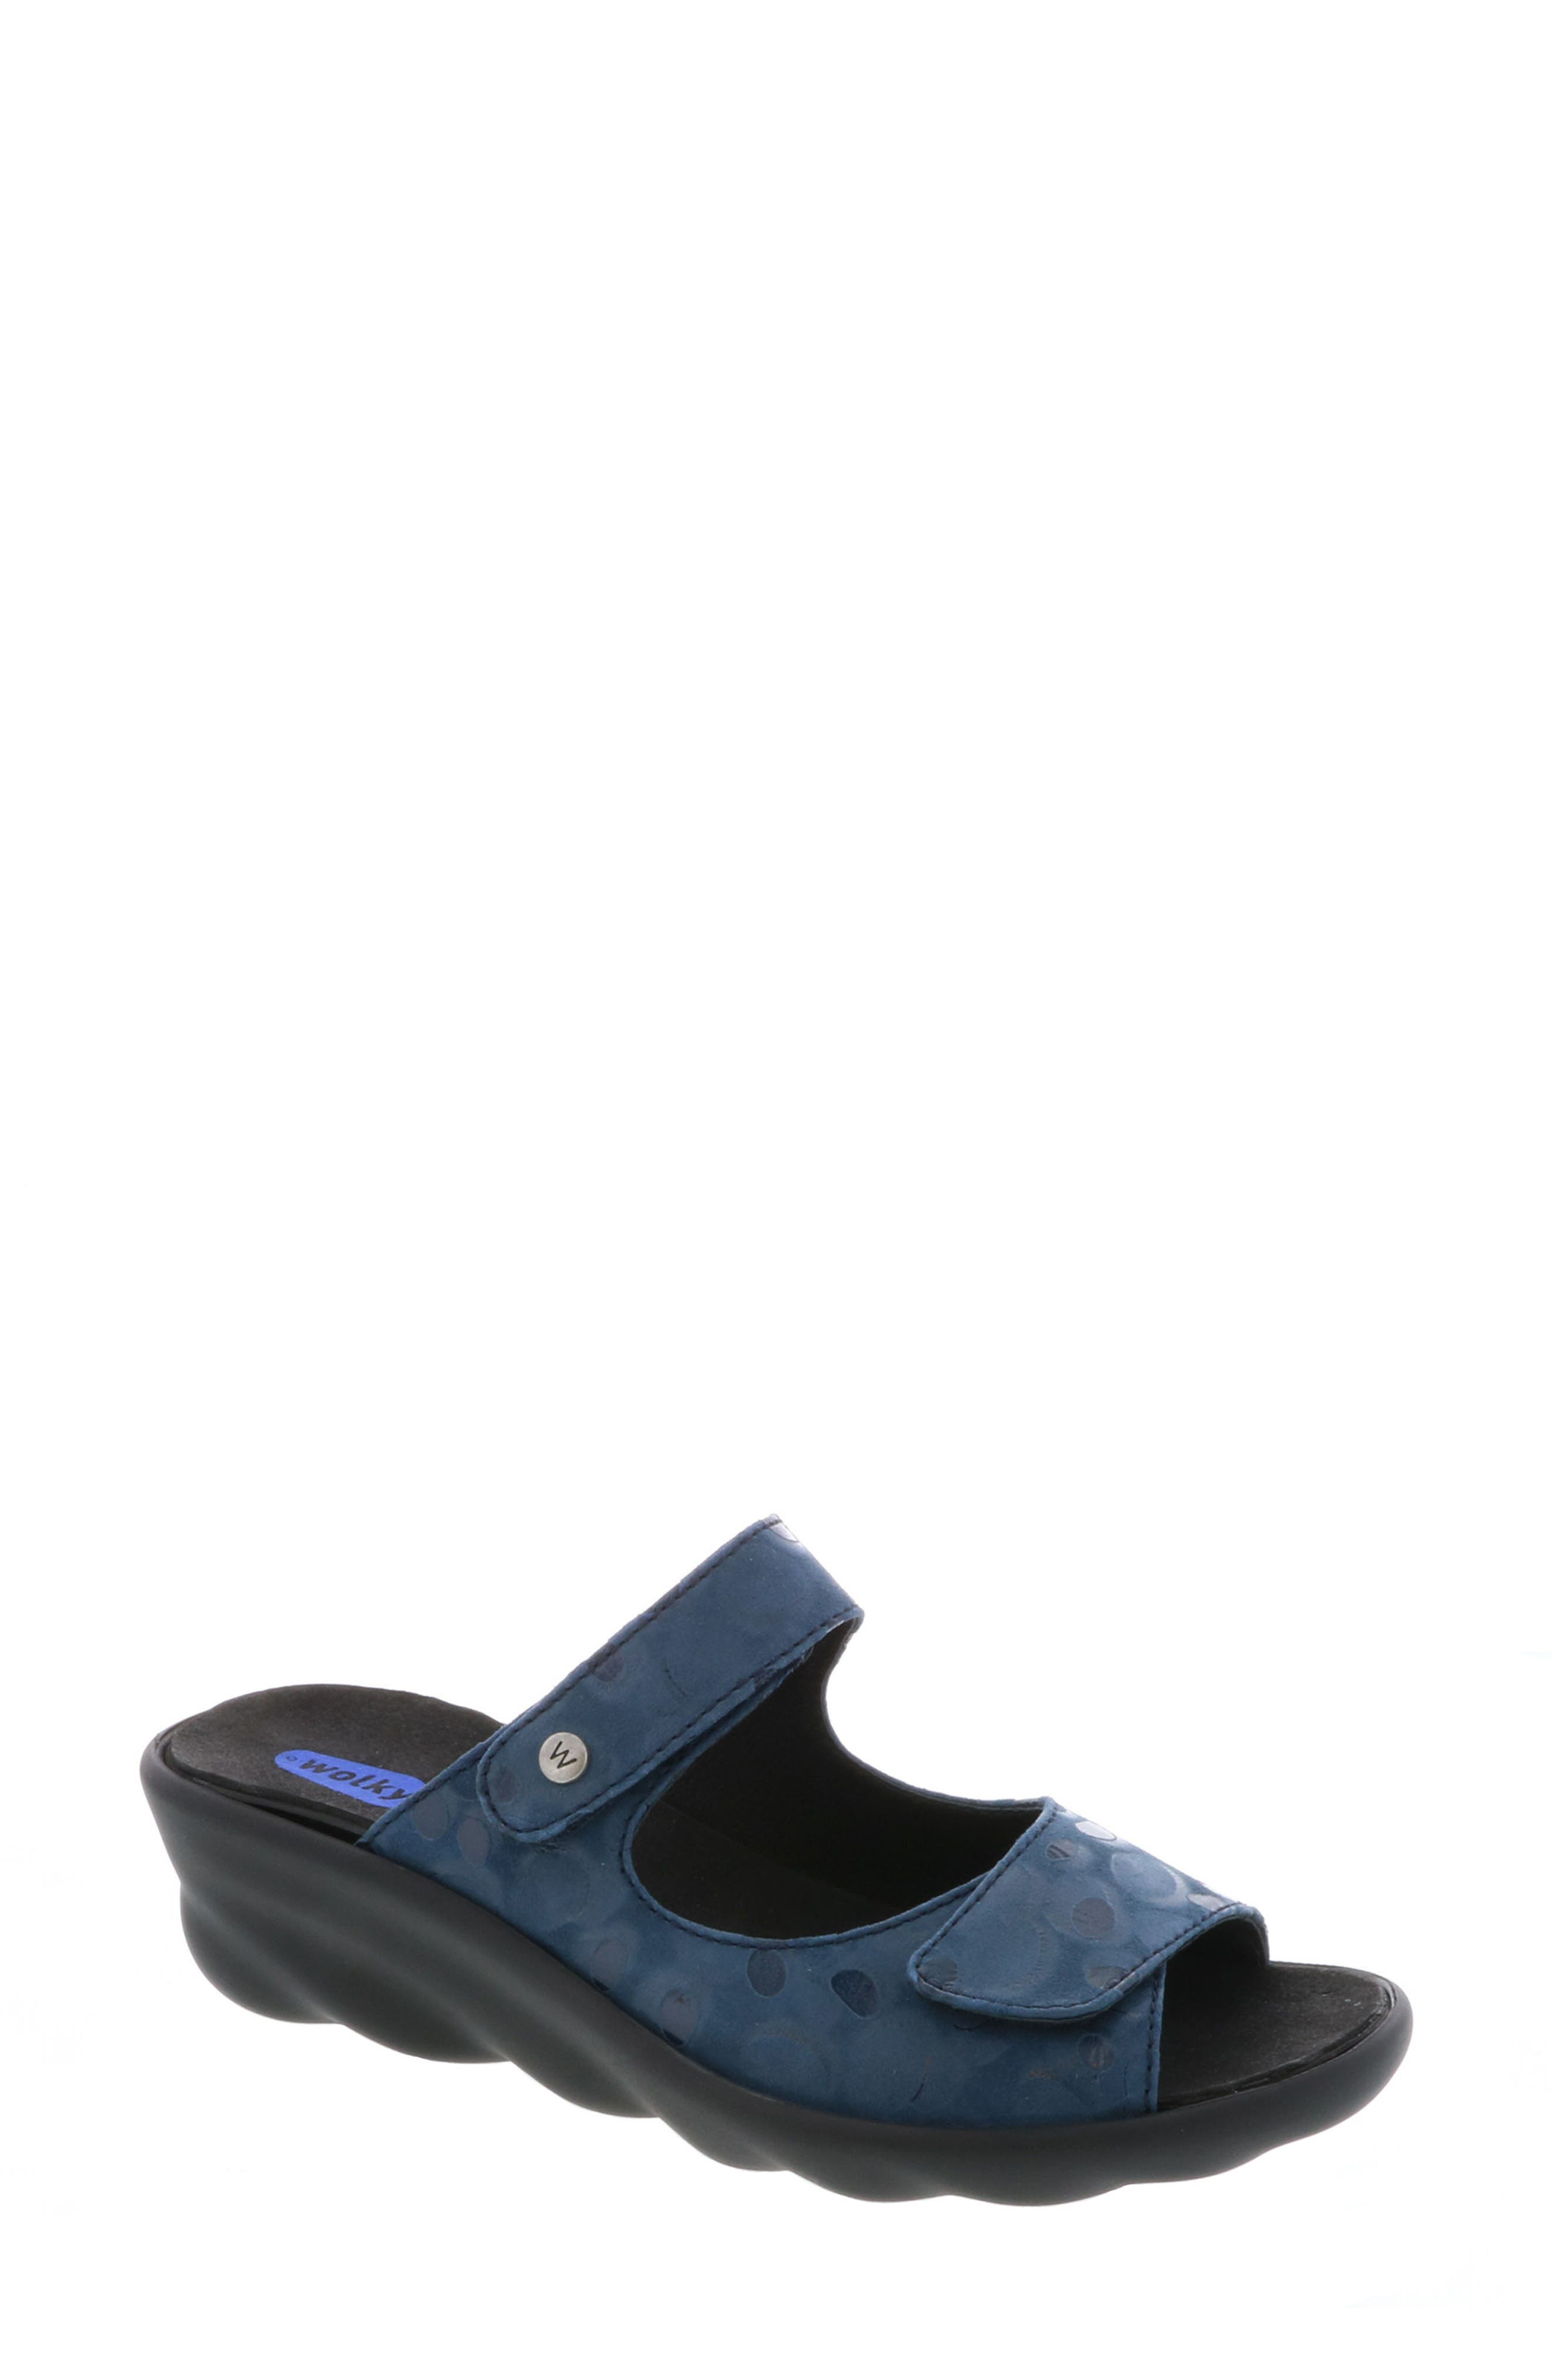 Bolena Slide Sandal,                         Main,                         color, Blue Circle Print